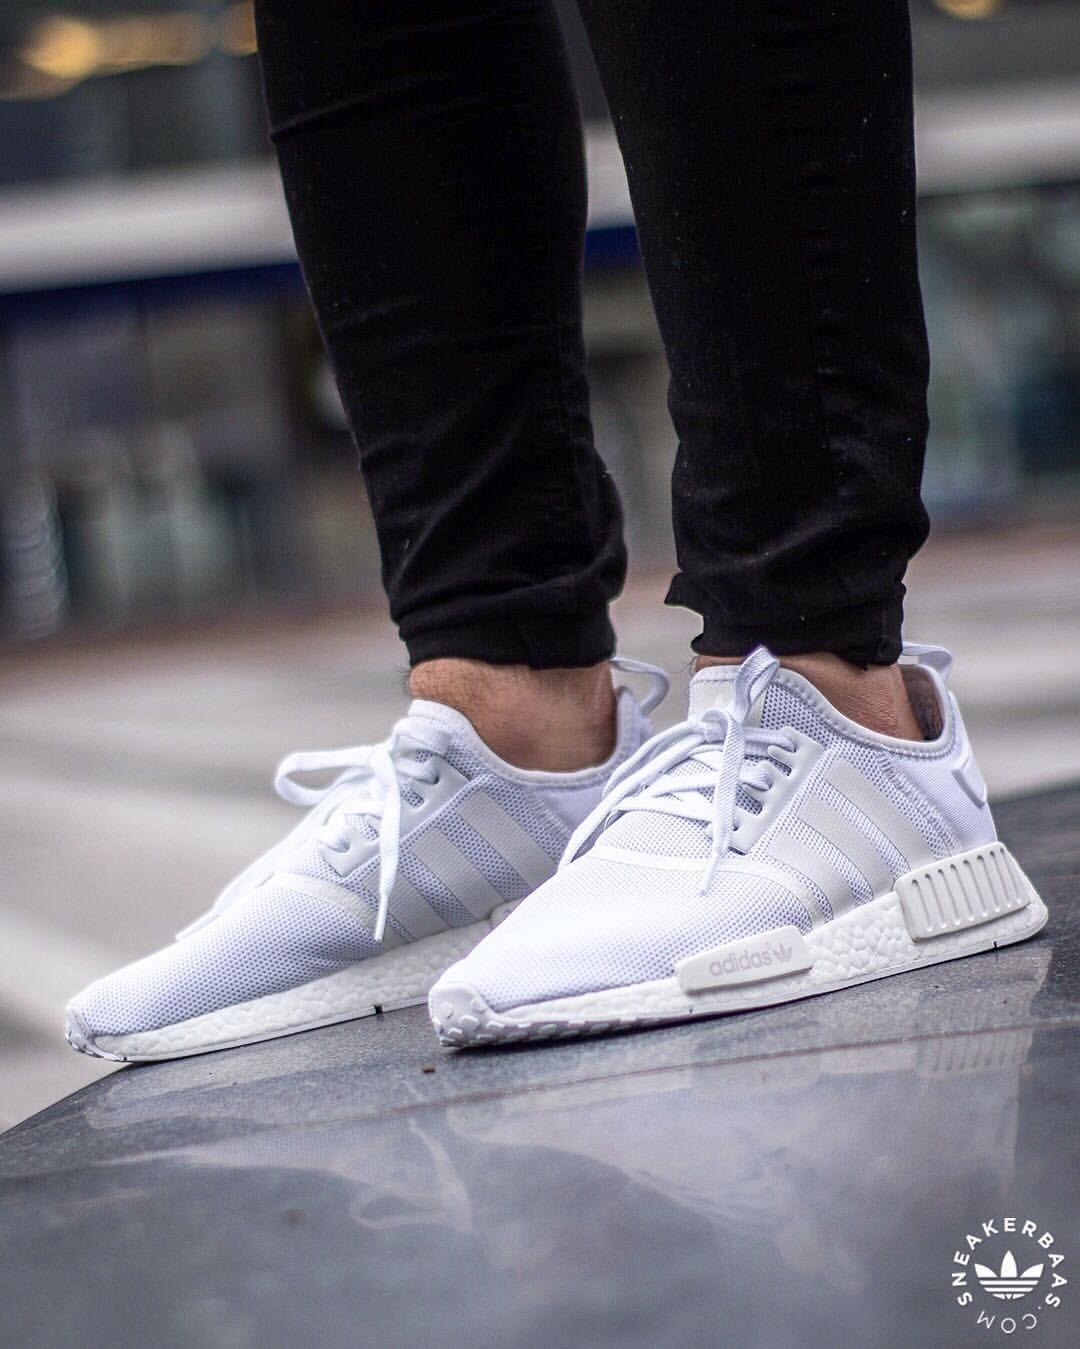 Adidas Nmd R1 Triple White Sneakers Adidas Nmd Sneakers Fashion